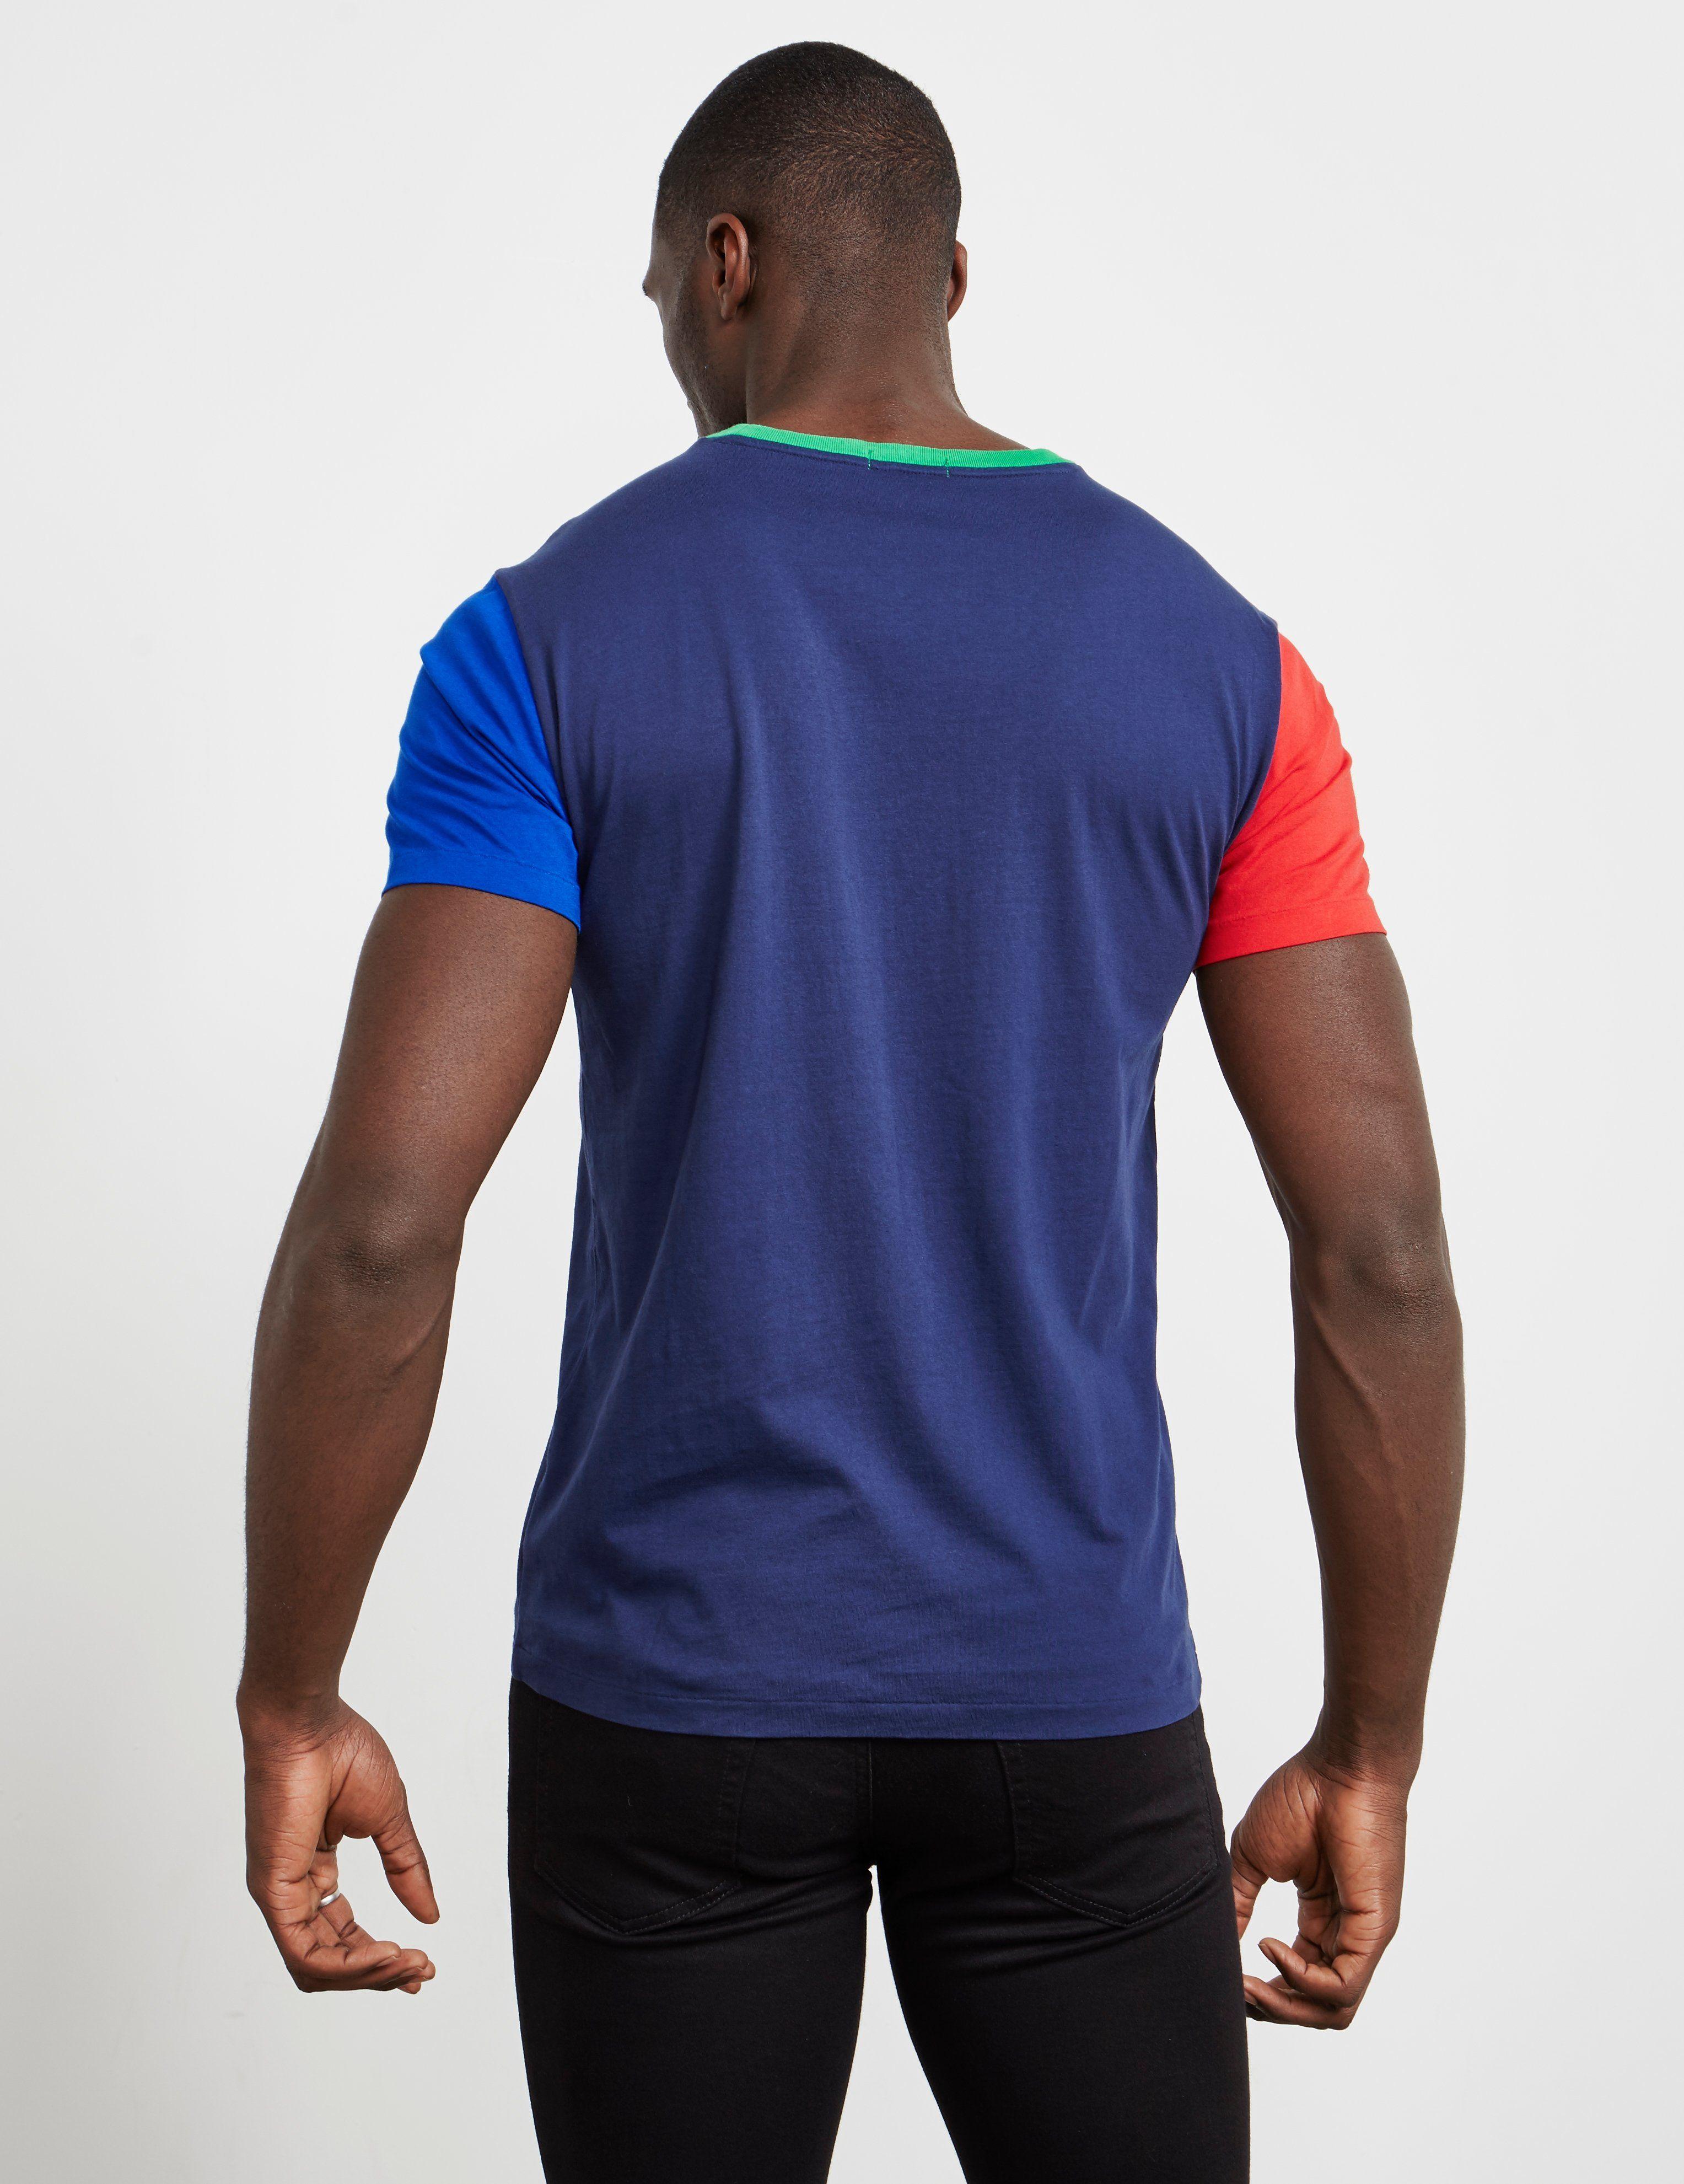 Polo Ralph Lauren Colour Block Short Sleeve T-Shirt - Exclusive